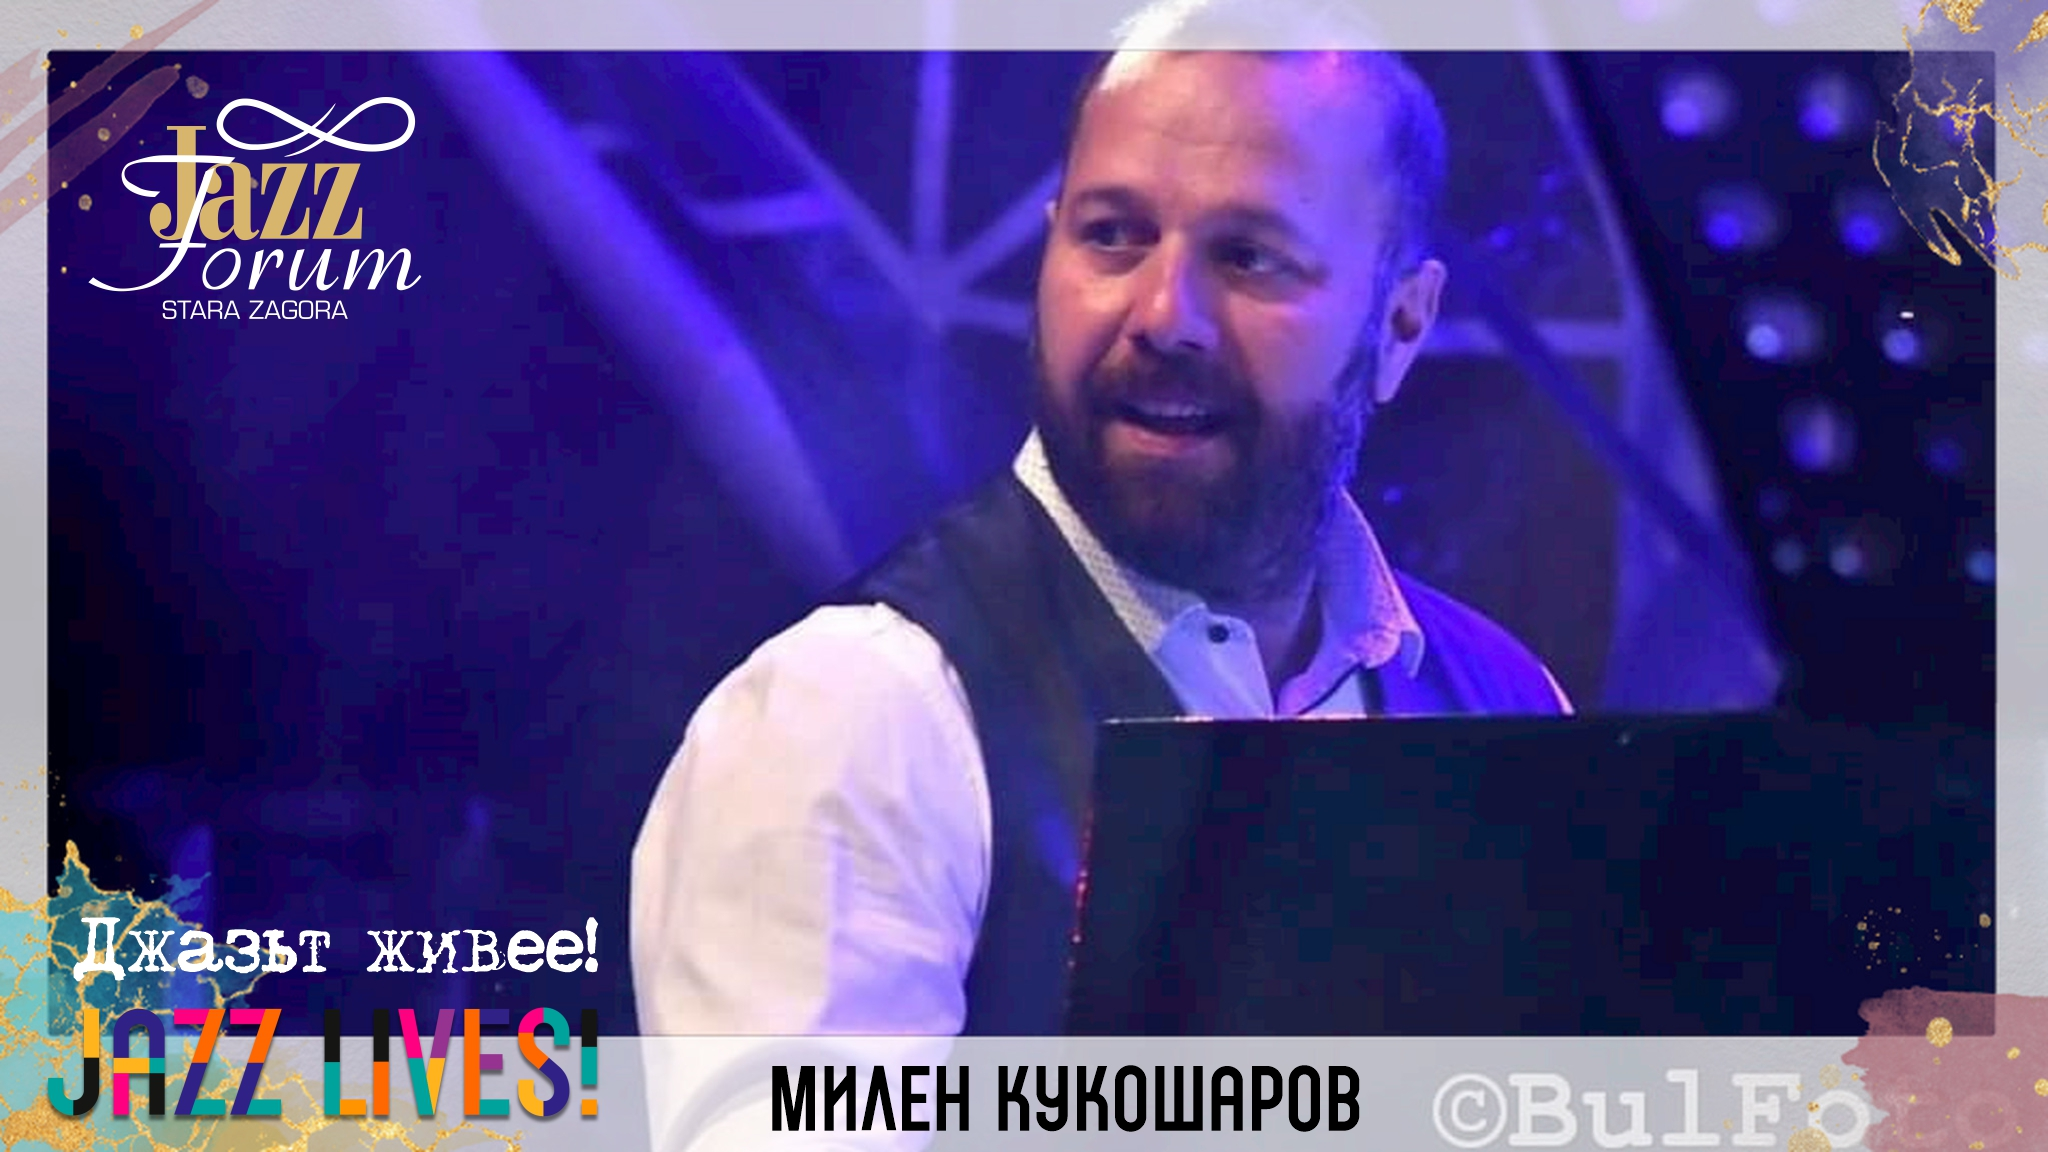 Джаз Форум Стара Загора 2021